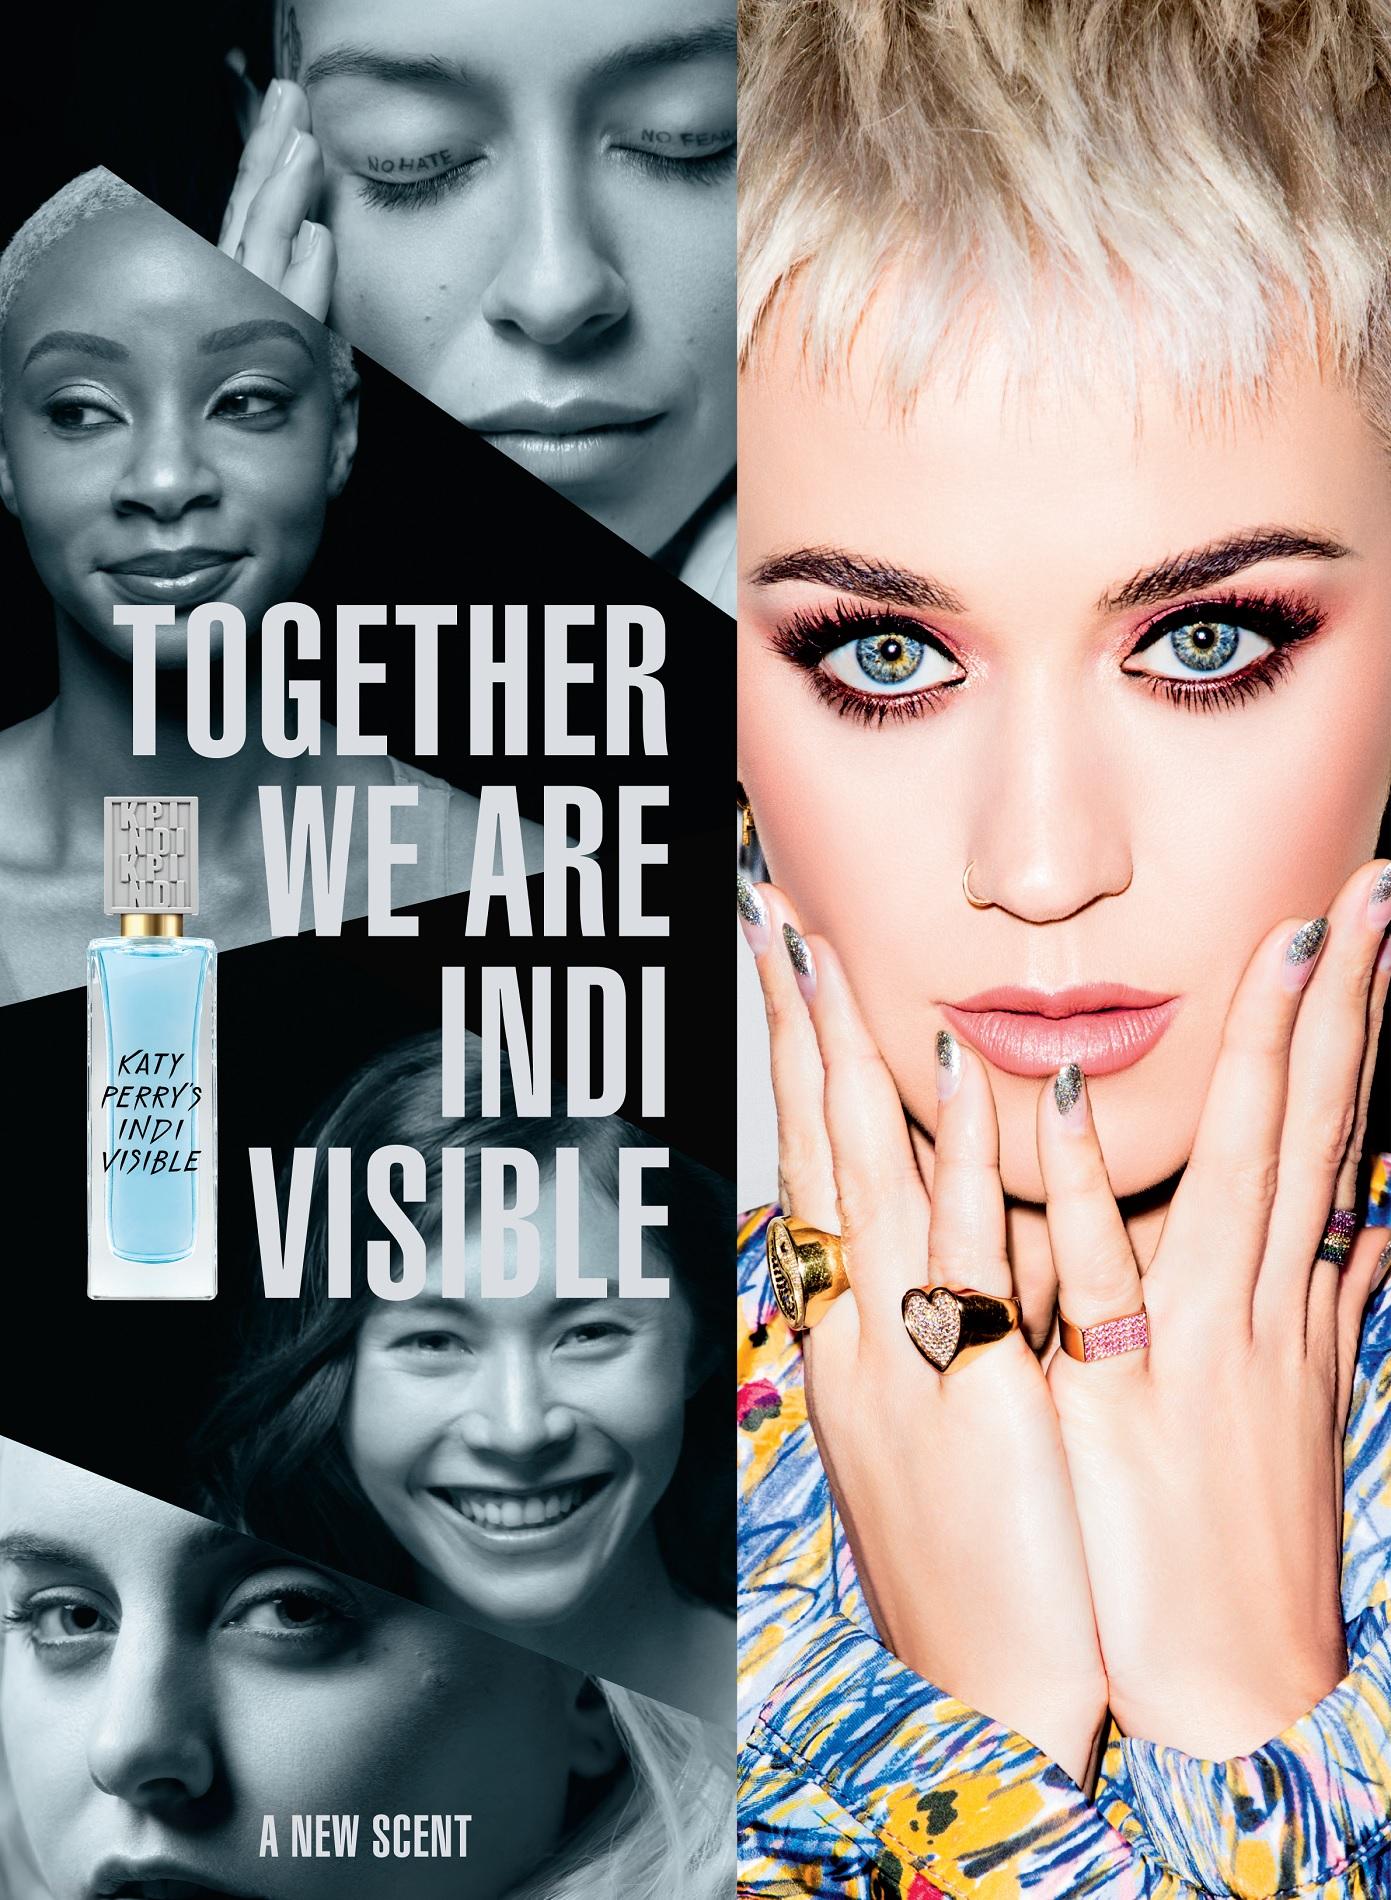 Katy Perrys Indi Visible New Fragrances